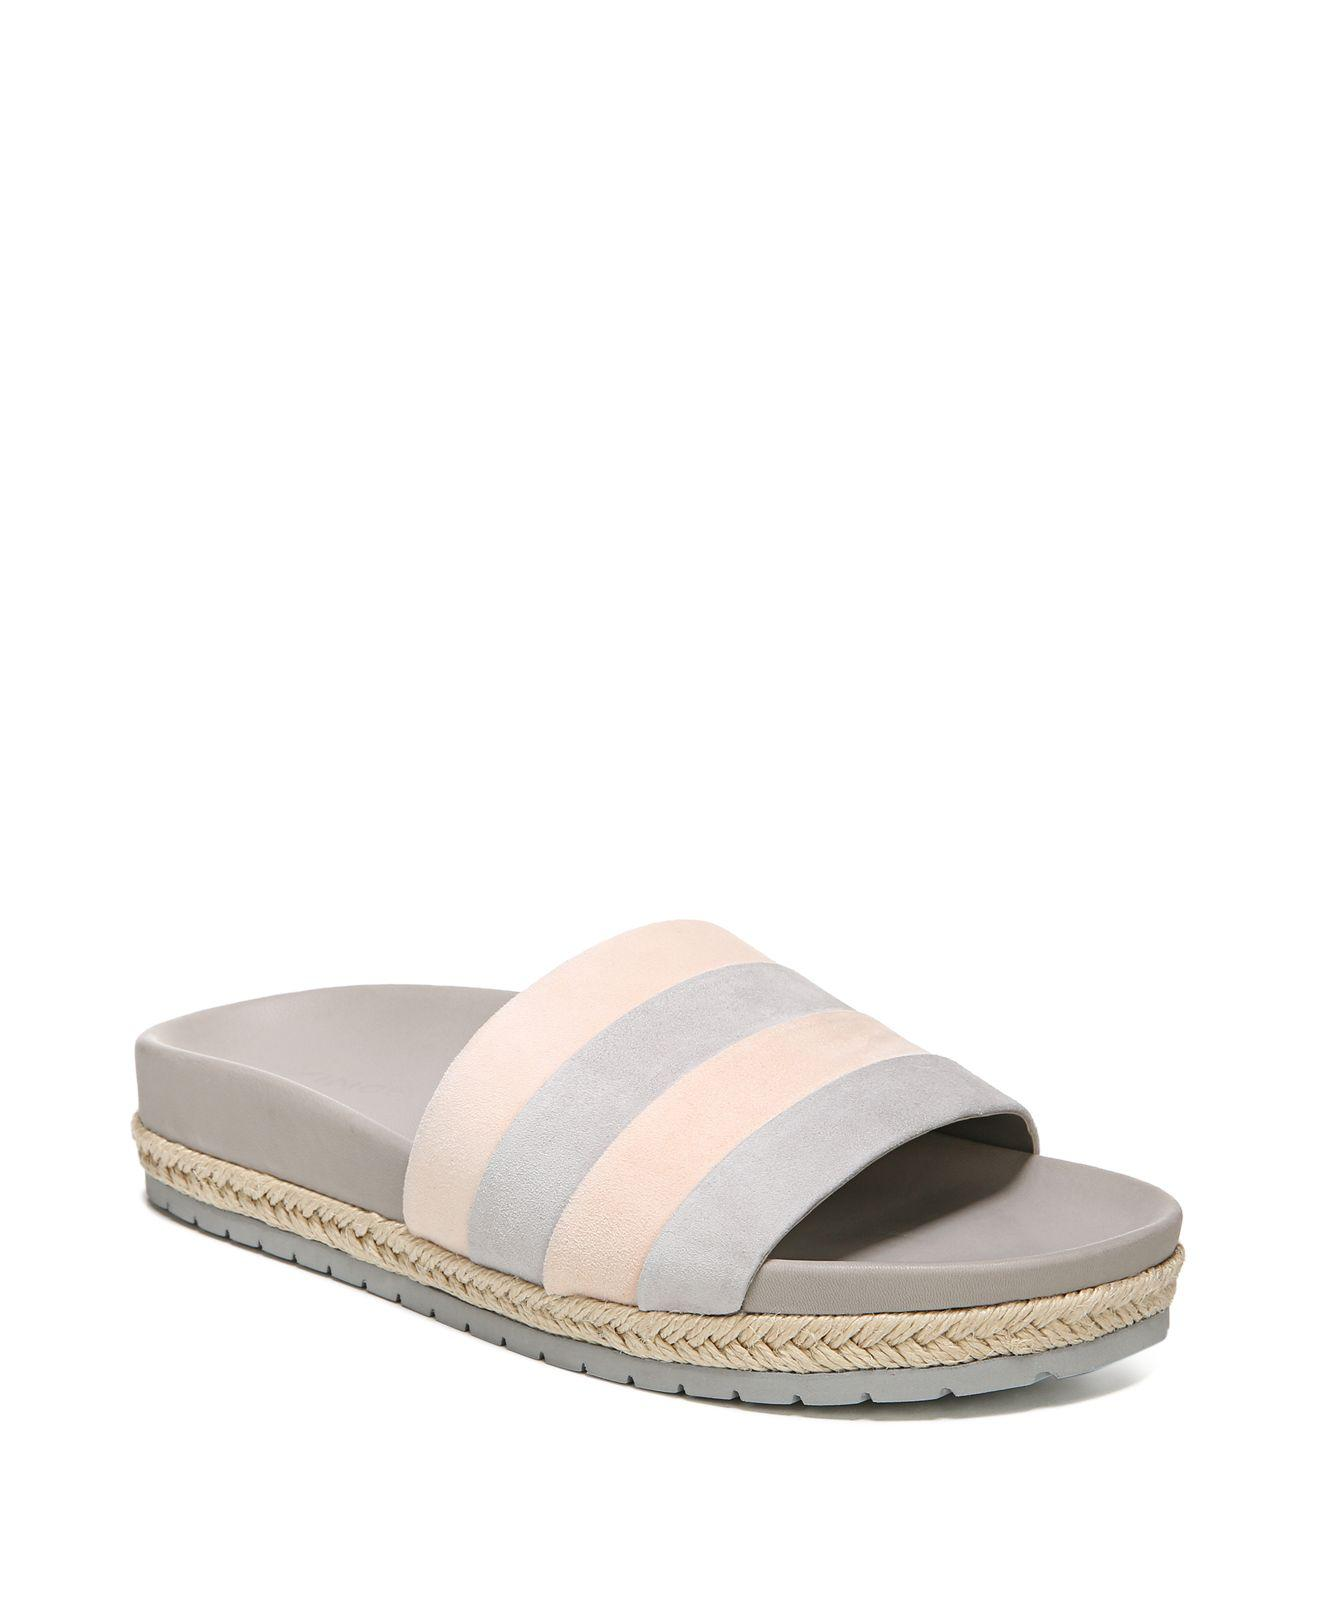 Vince Women's Alisa Color-Block Leather Pool Slide Sandals uzBnI